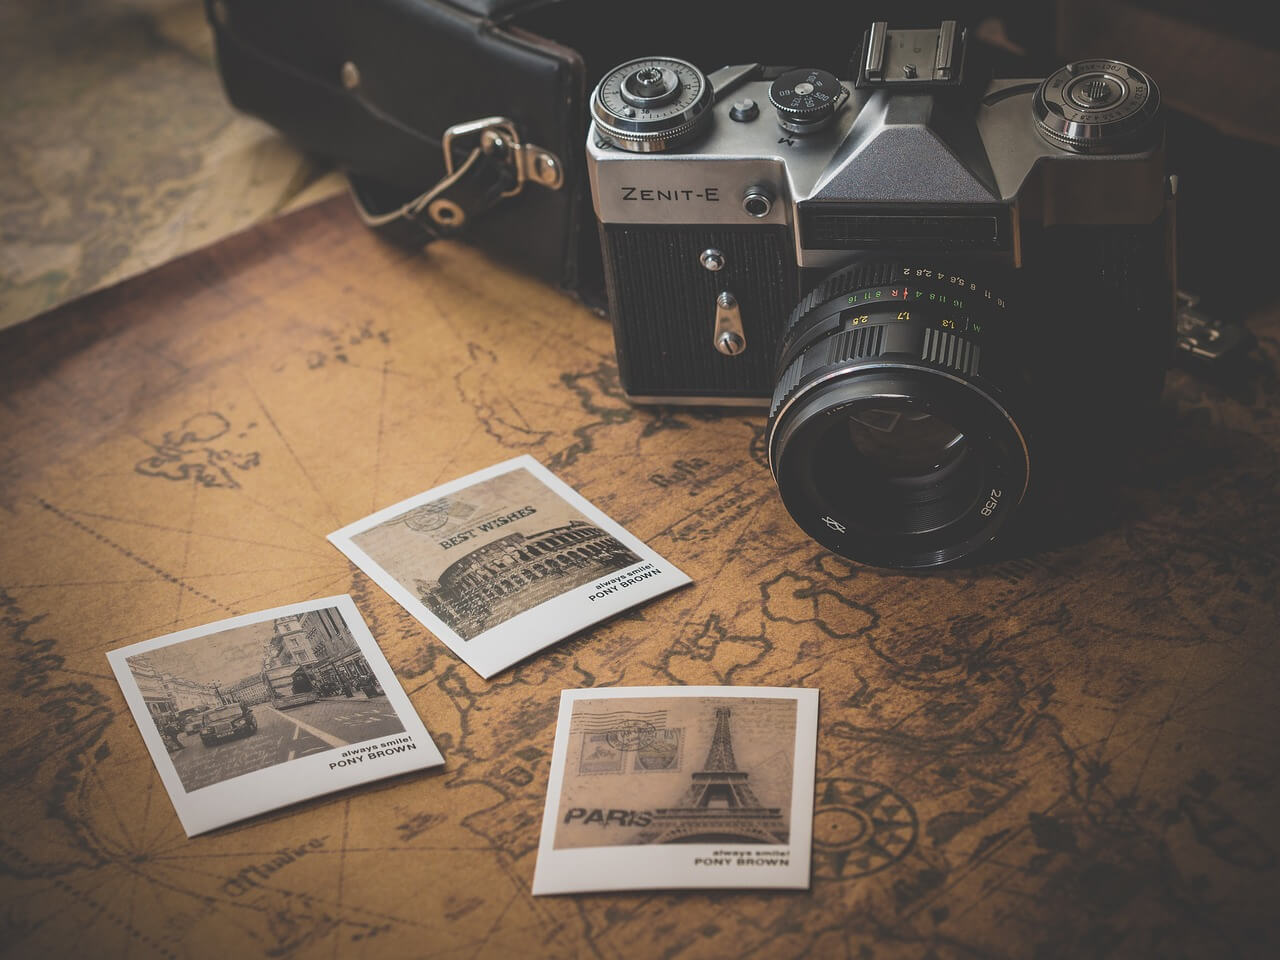 lugares históricos para viajar